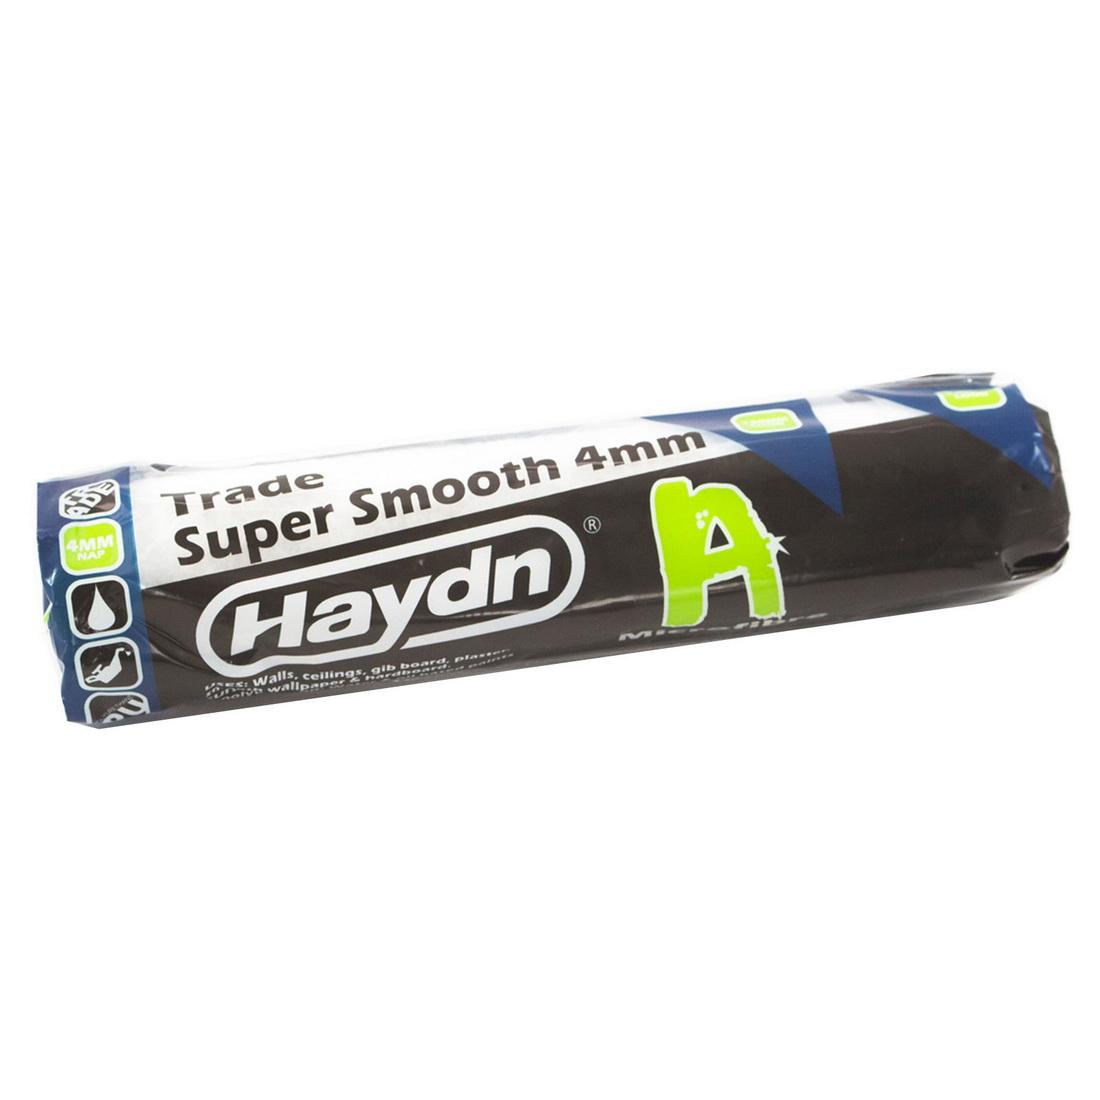 Trade Range 230mm Microfibre Super Smooth Roller Sleeve